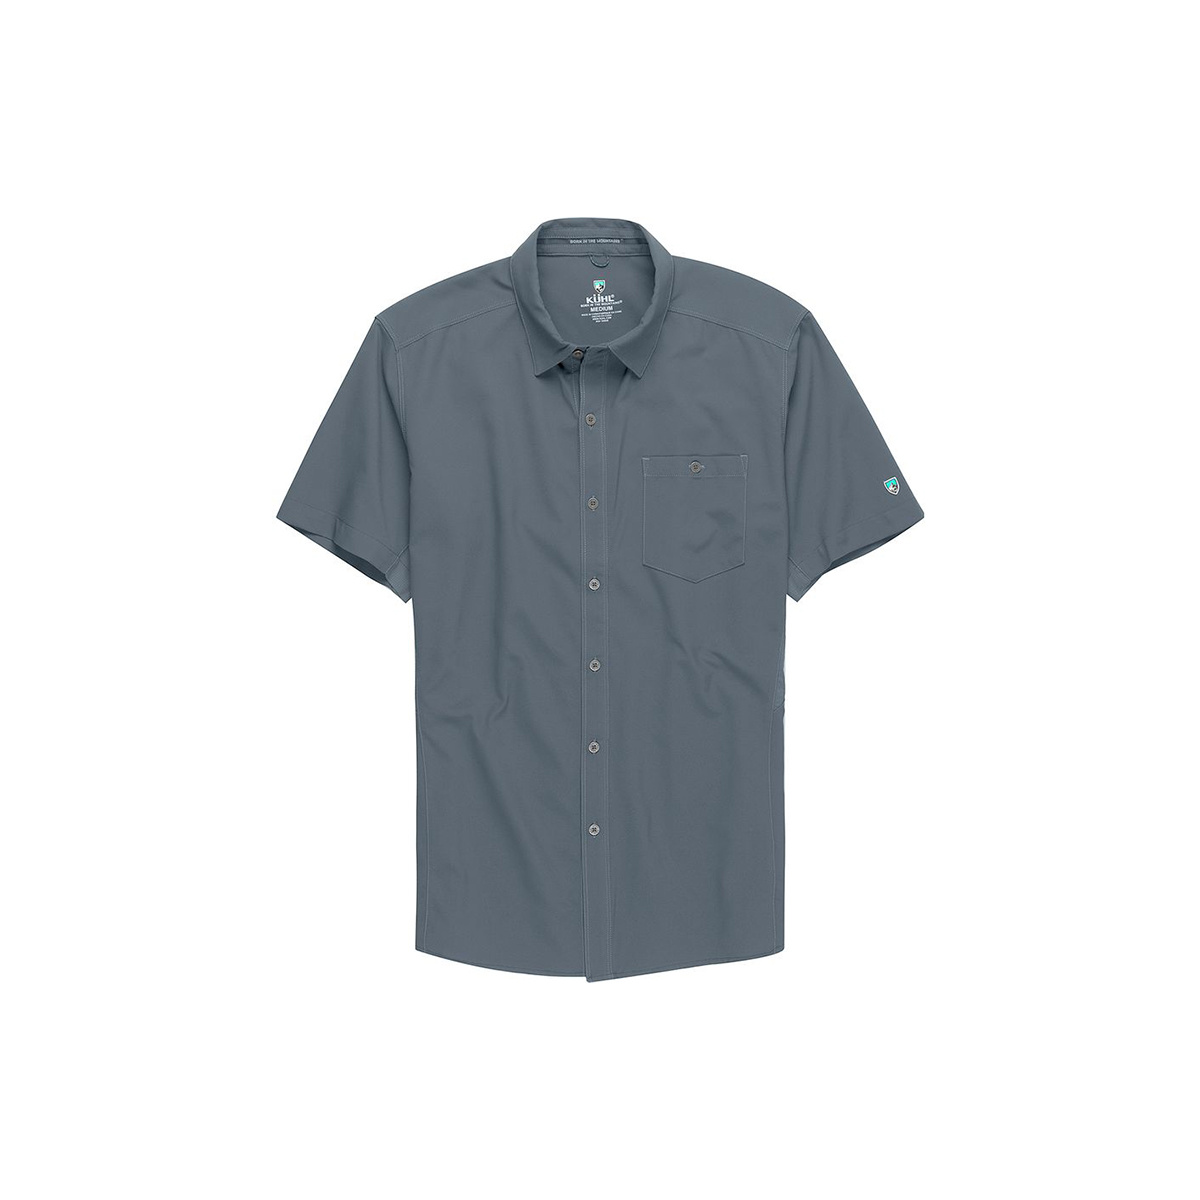 Kuhl Men's Bandit Short Sleeve